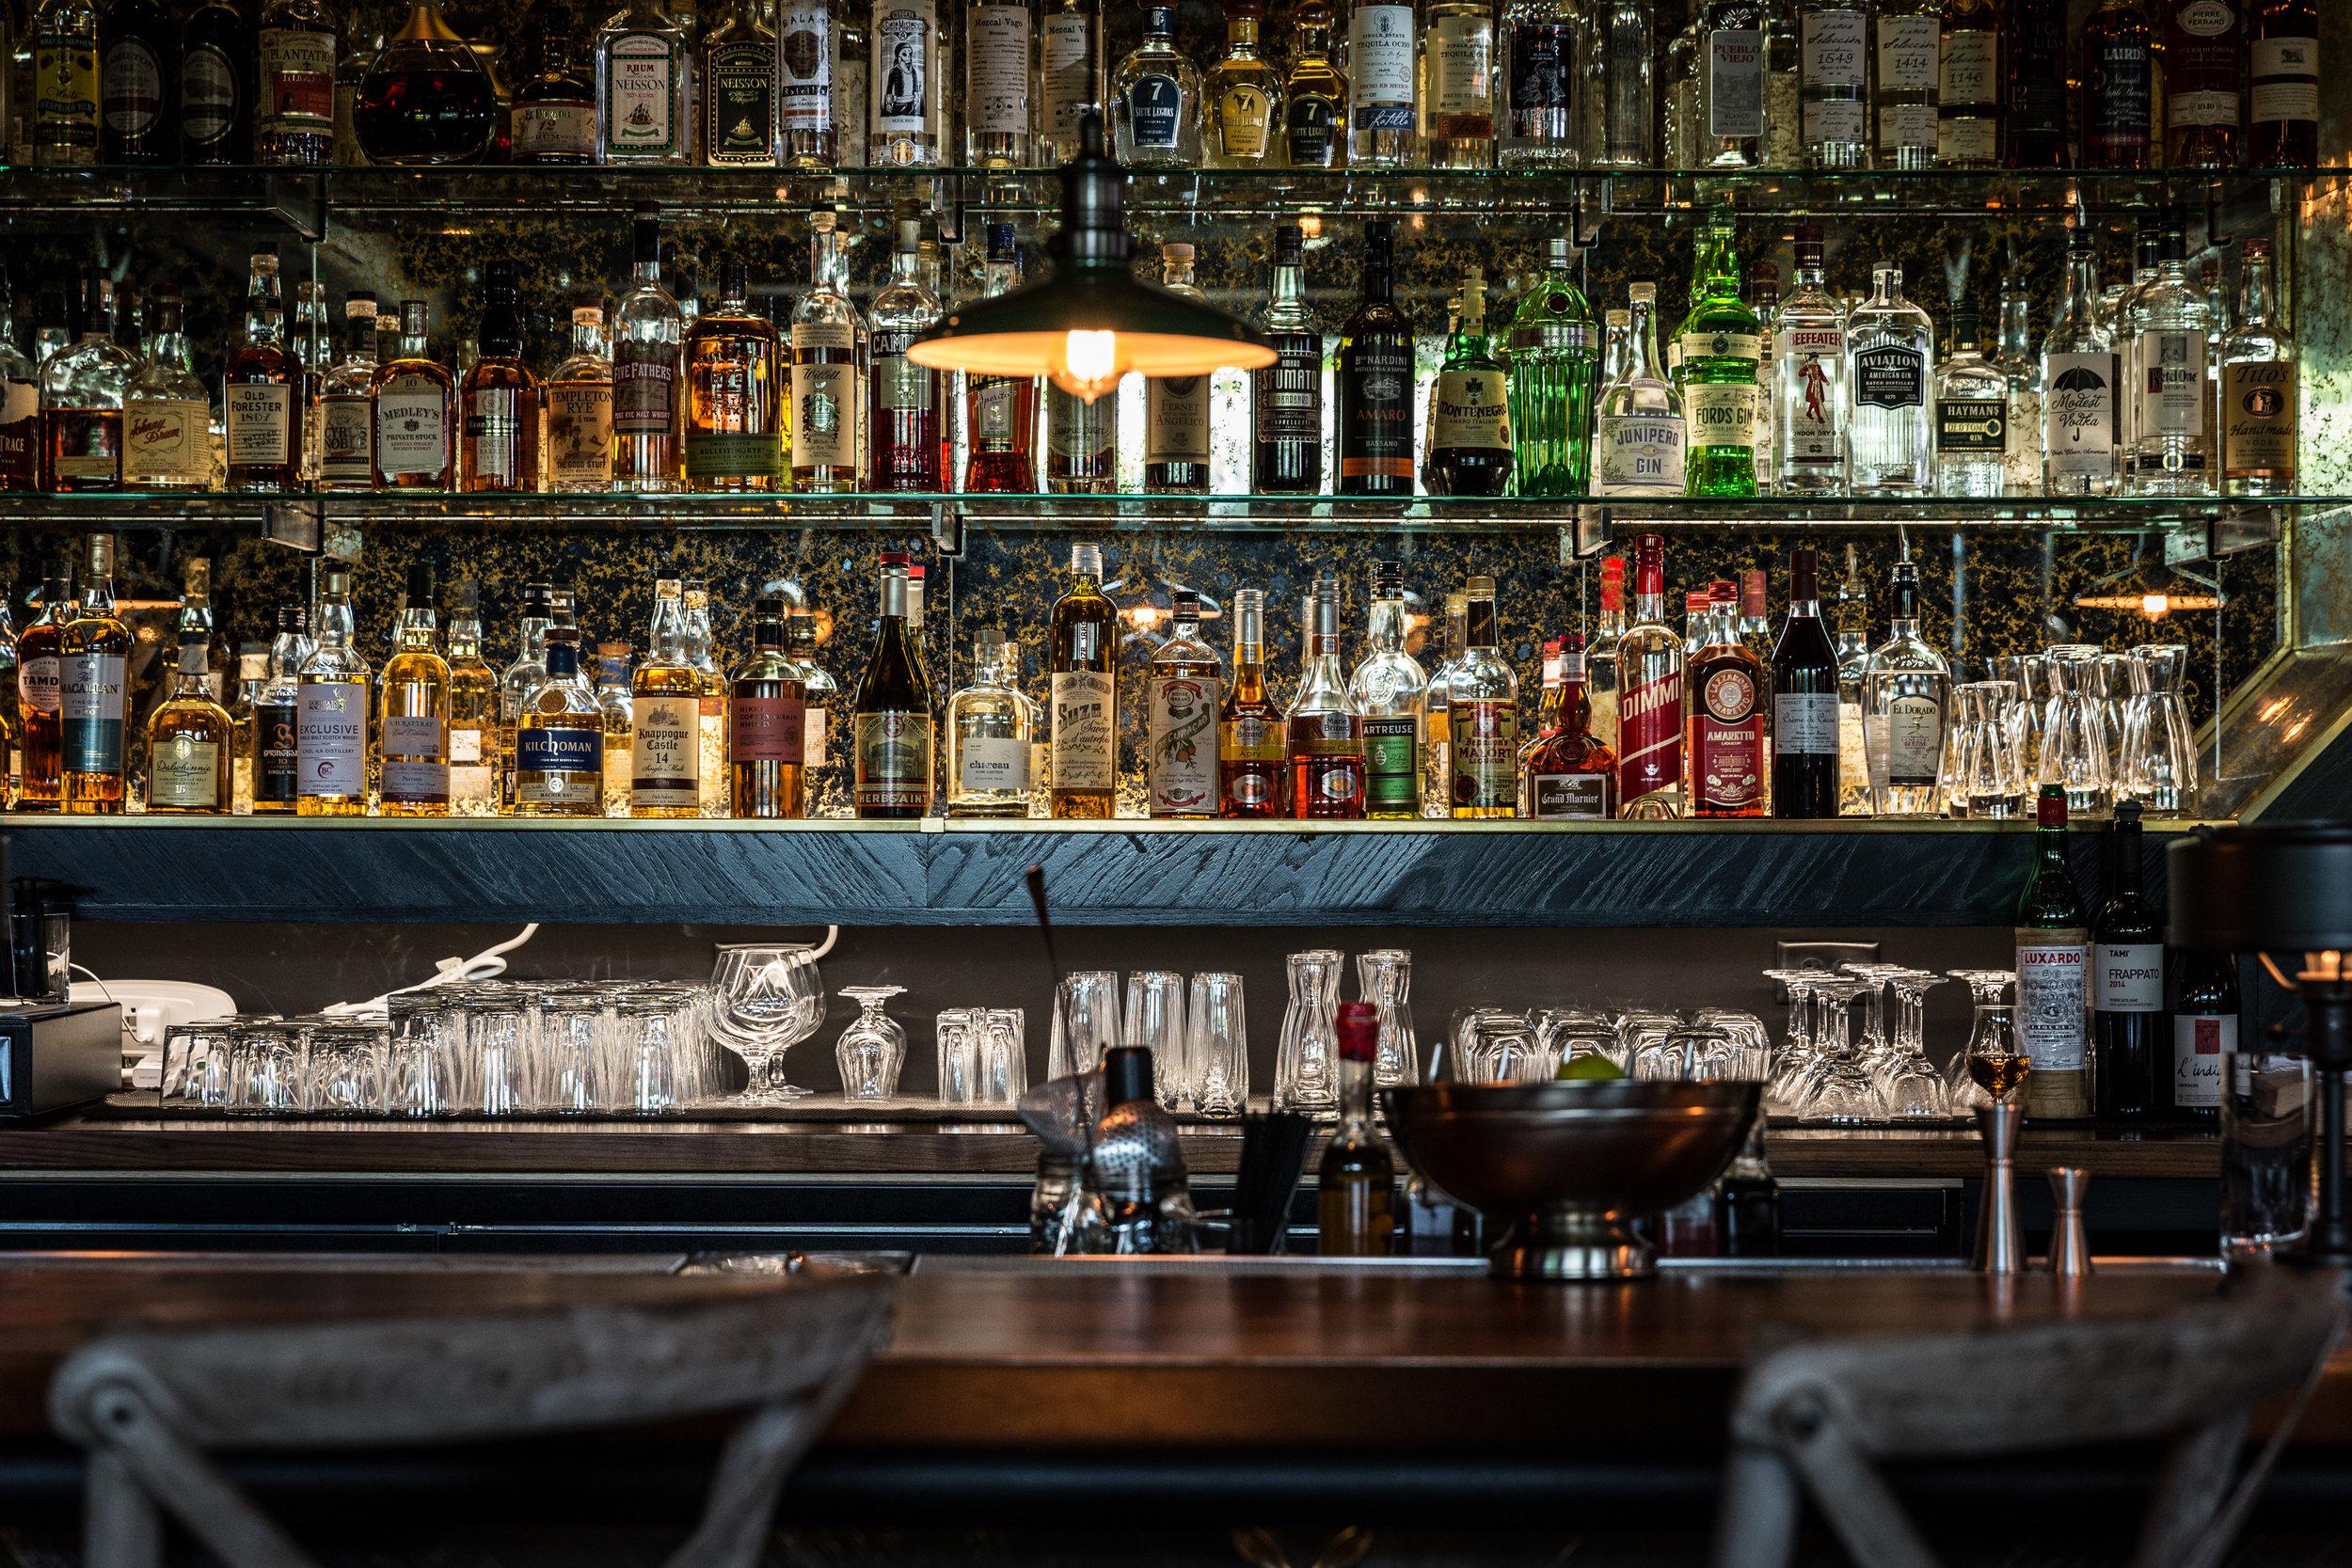 studio-saint-bars-and-restaurants-smyth-and-the-loyalist-washington-dc-16